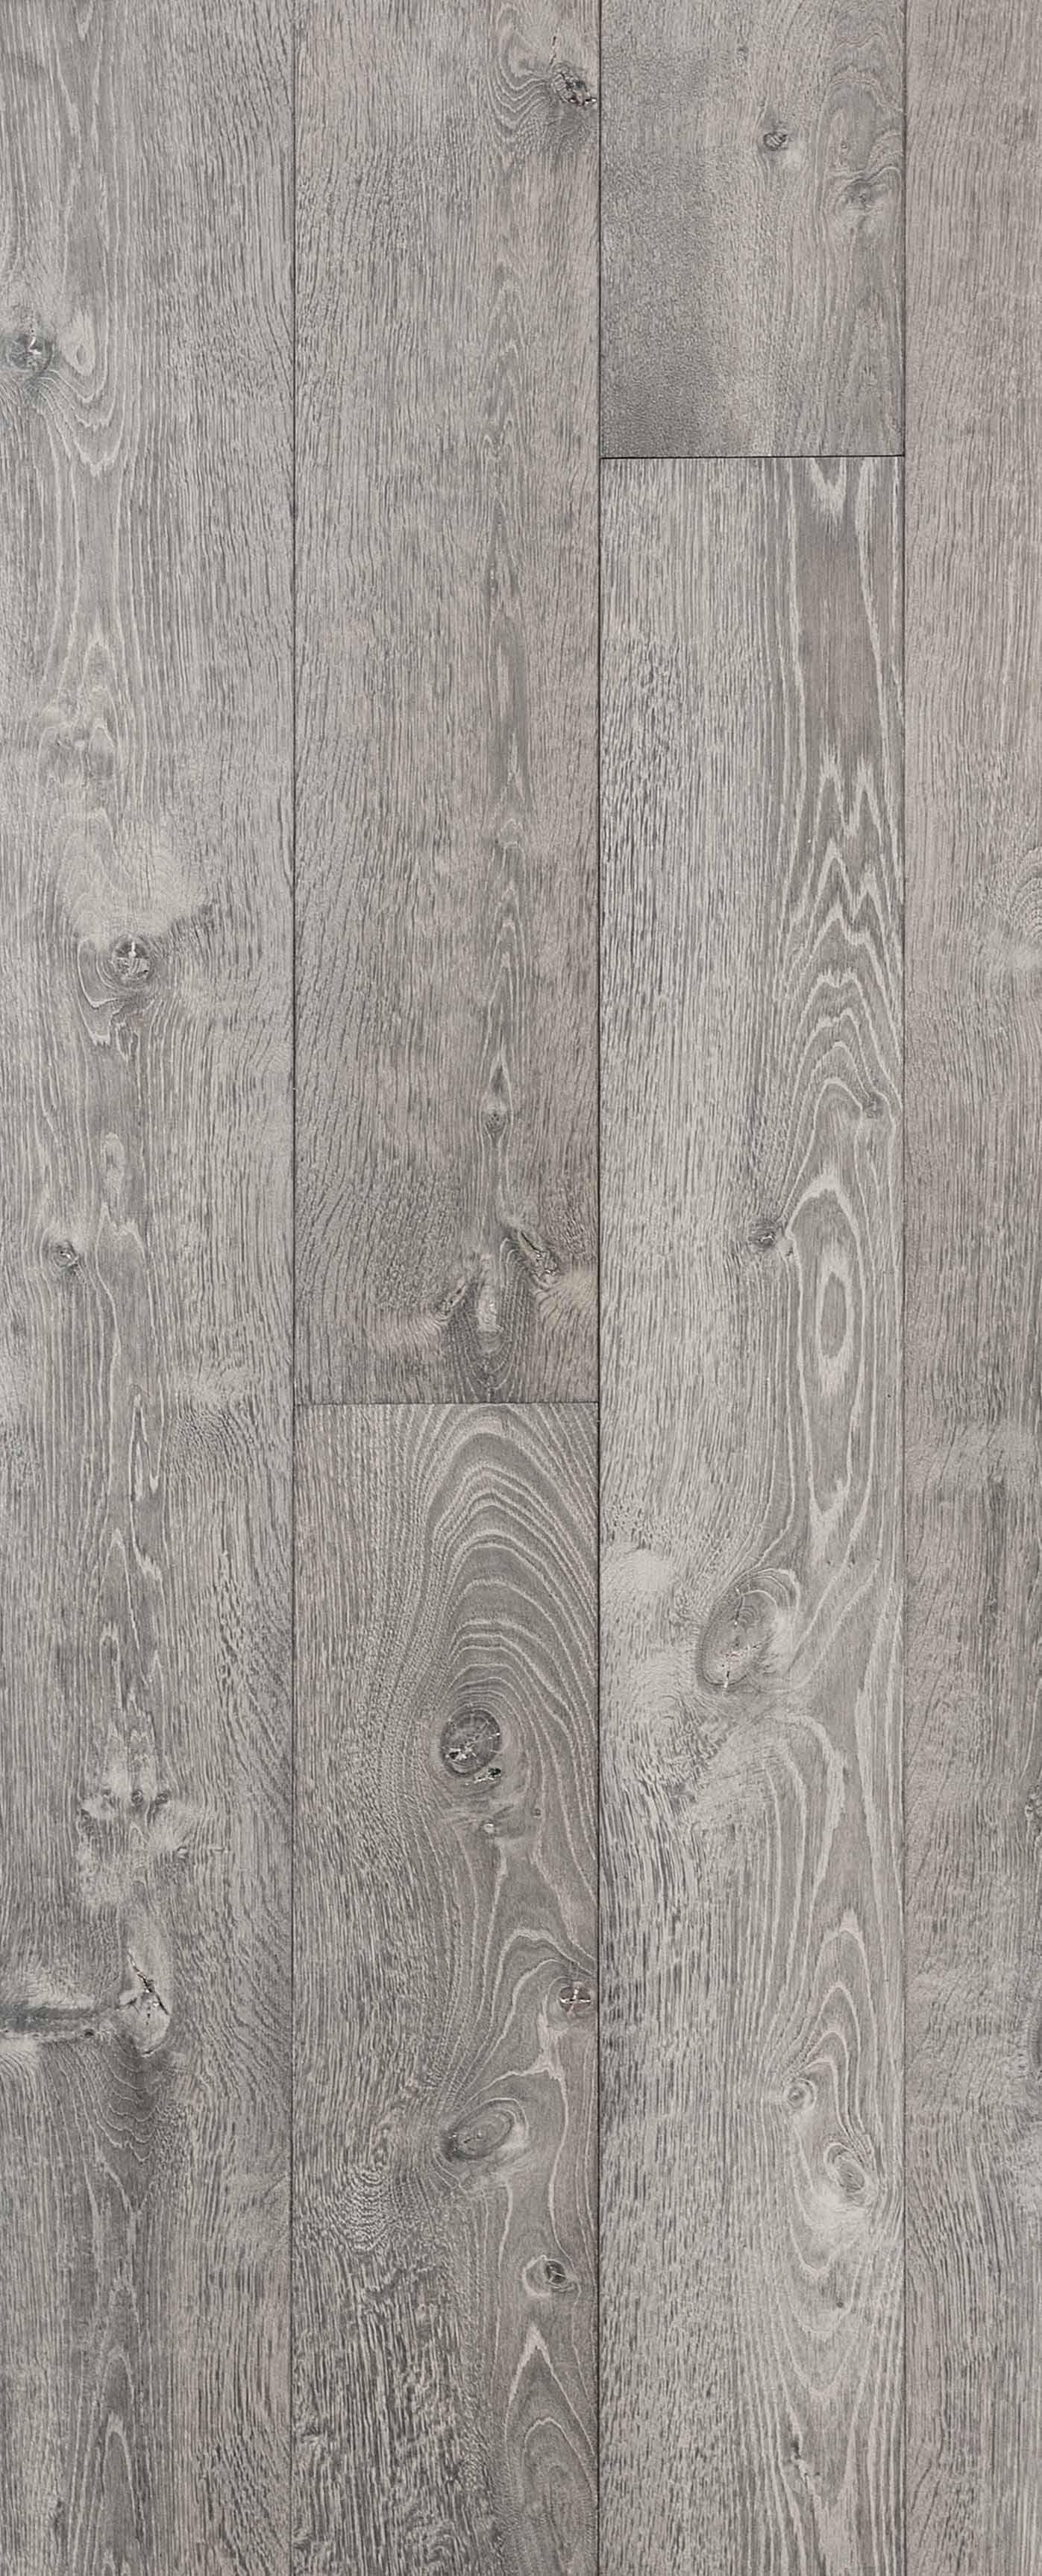 15 Stunning European White Oak Floors Design Ideas For Amazing Home Woodfloortexture 15 Stunning European White In 2020 Grey Wood Floors Flooring Grey Flooring